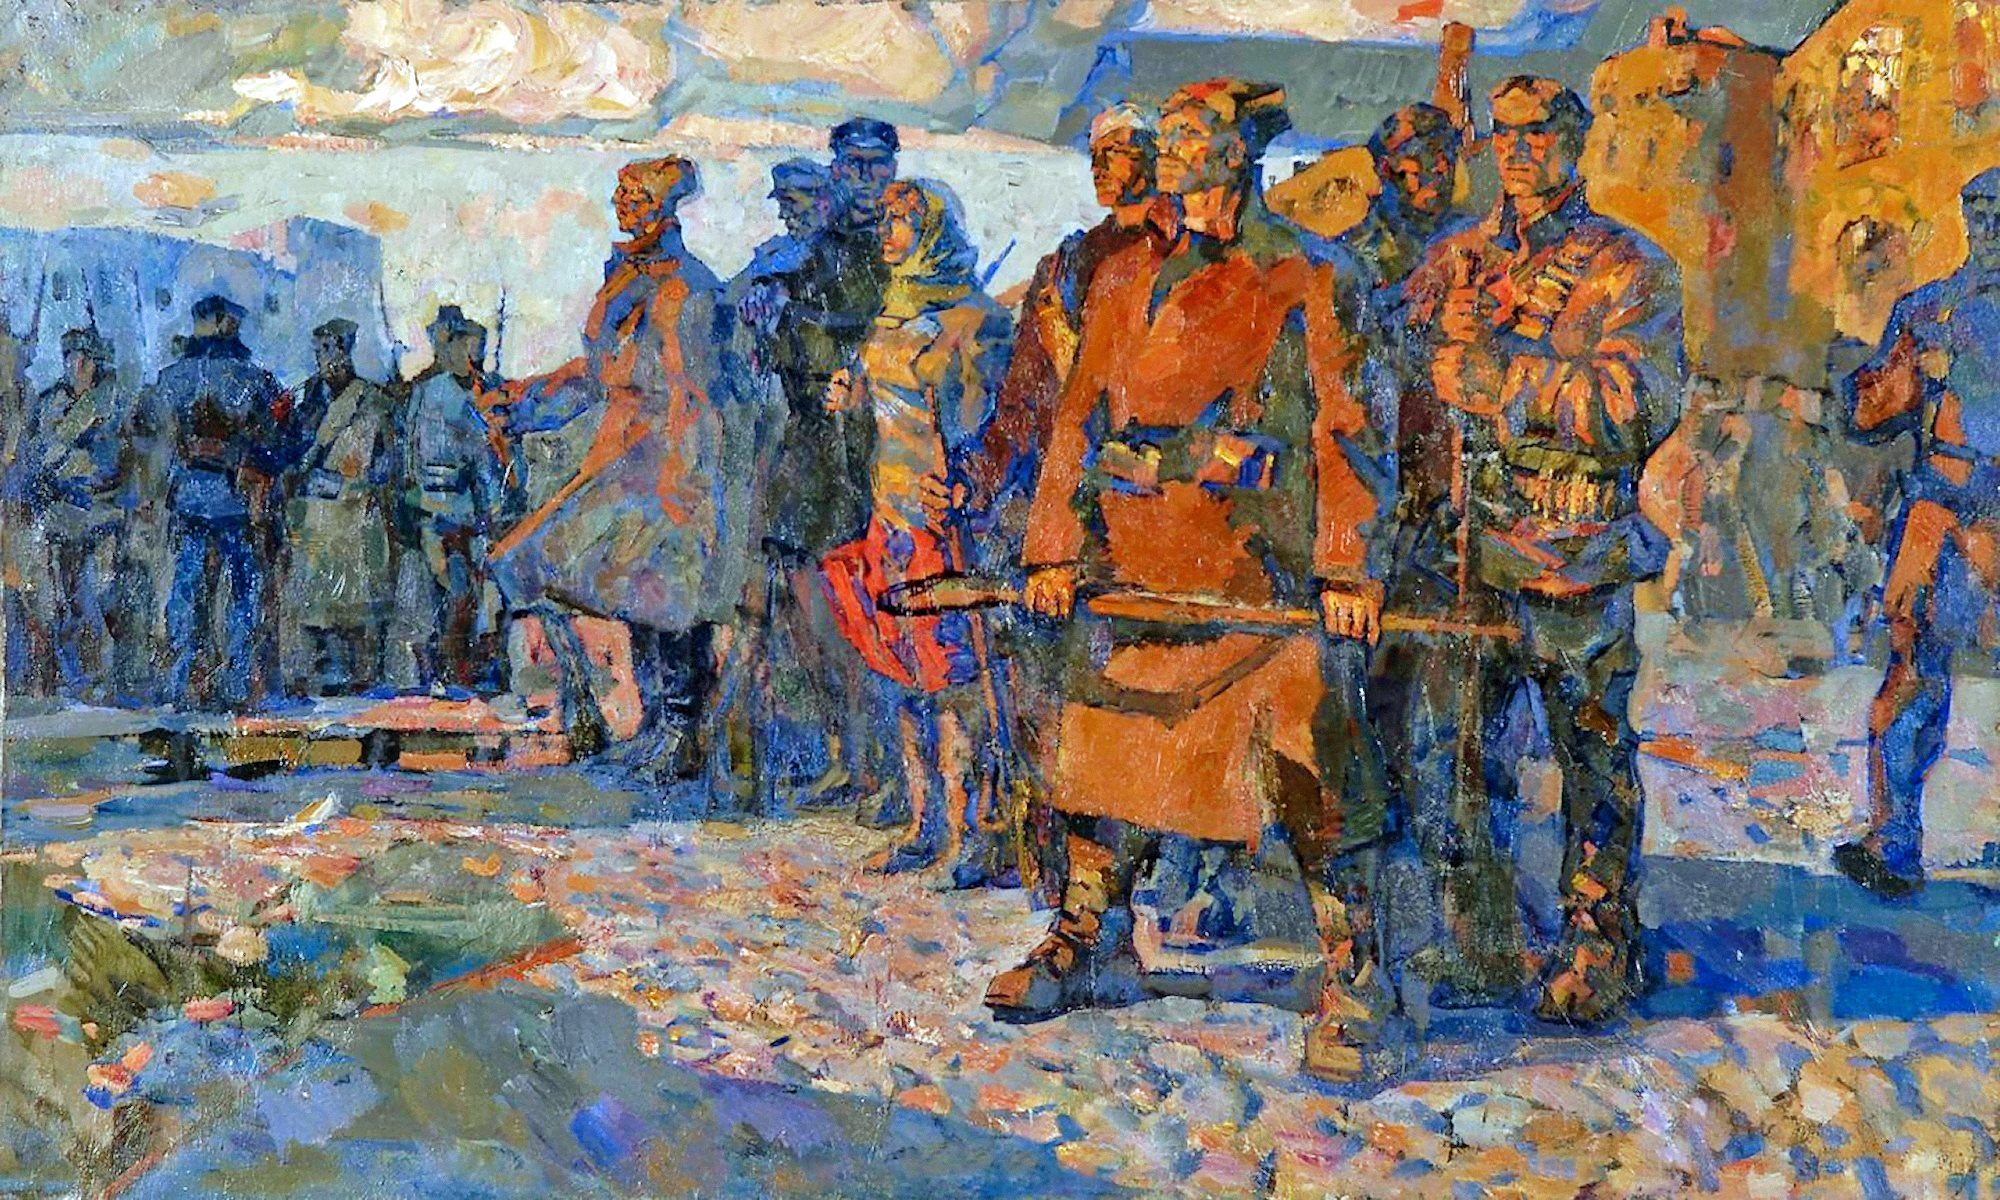 00 Aleksandr Turansky. Rebels. 1957